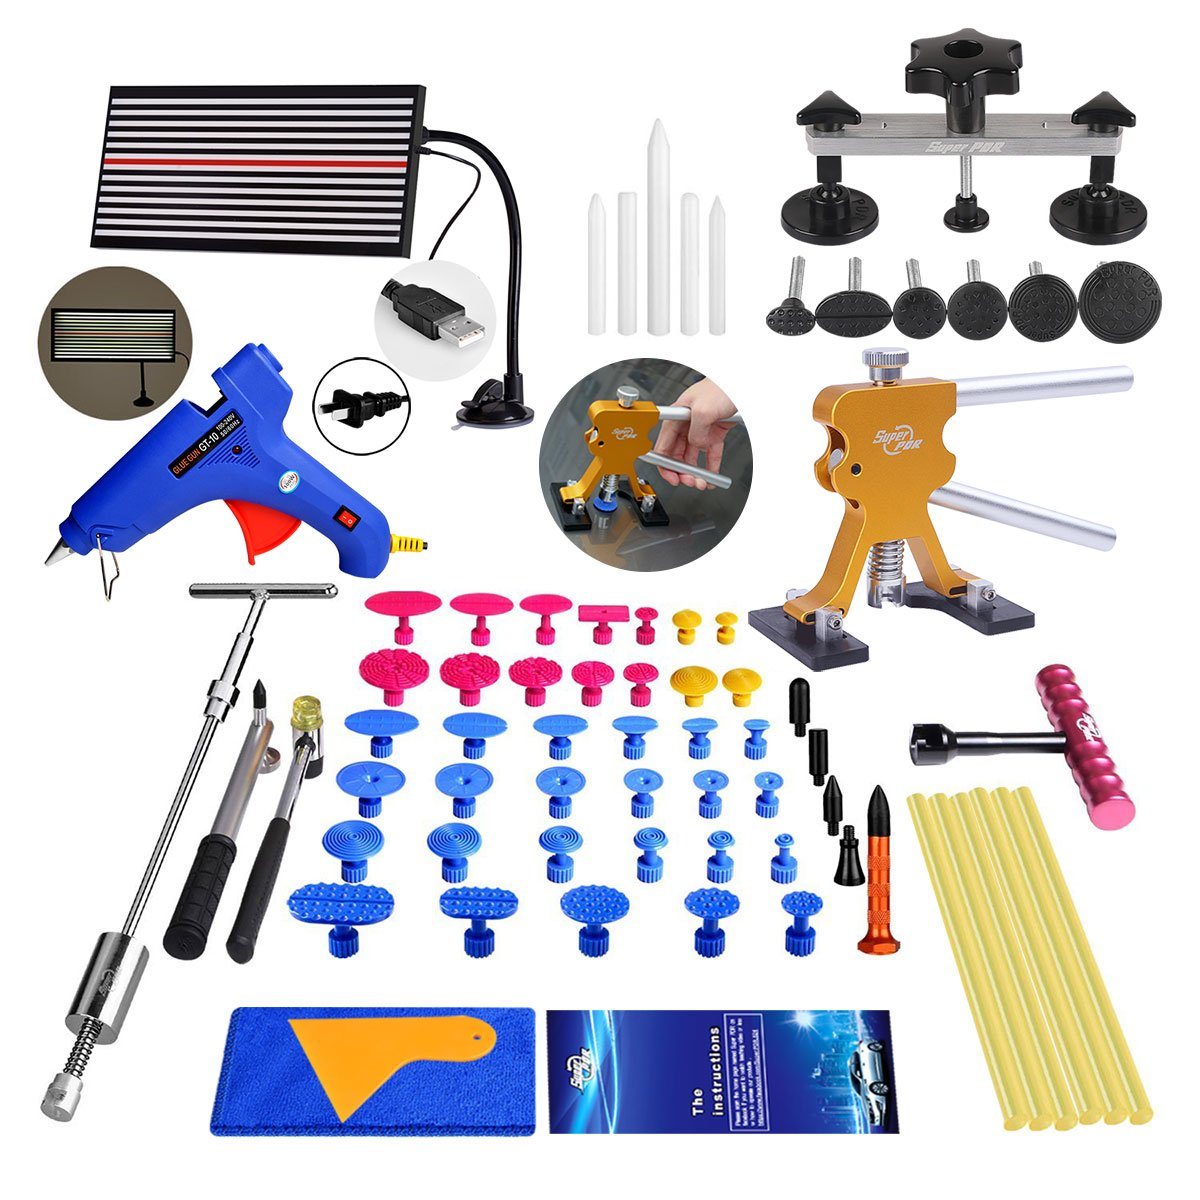 Super PDR 56Pcs Auto Car Paintless Dent Repair Tools kit - Dent Bridge Dent Puller Kit with Hot Melt Glue Gun Glue Sticks for Car Body Dent Repair